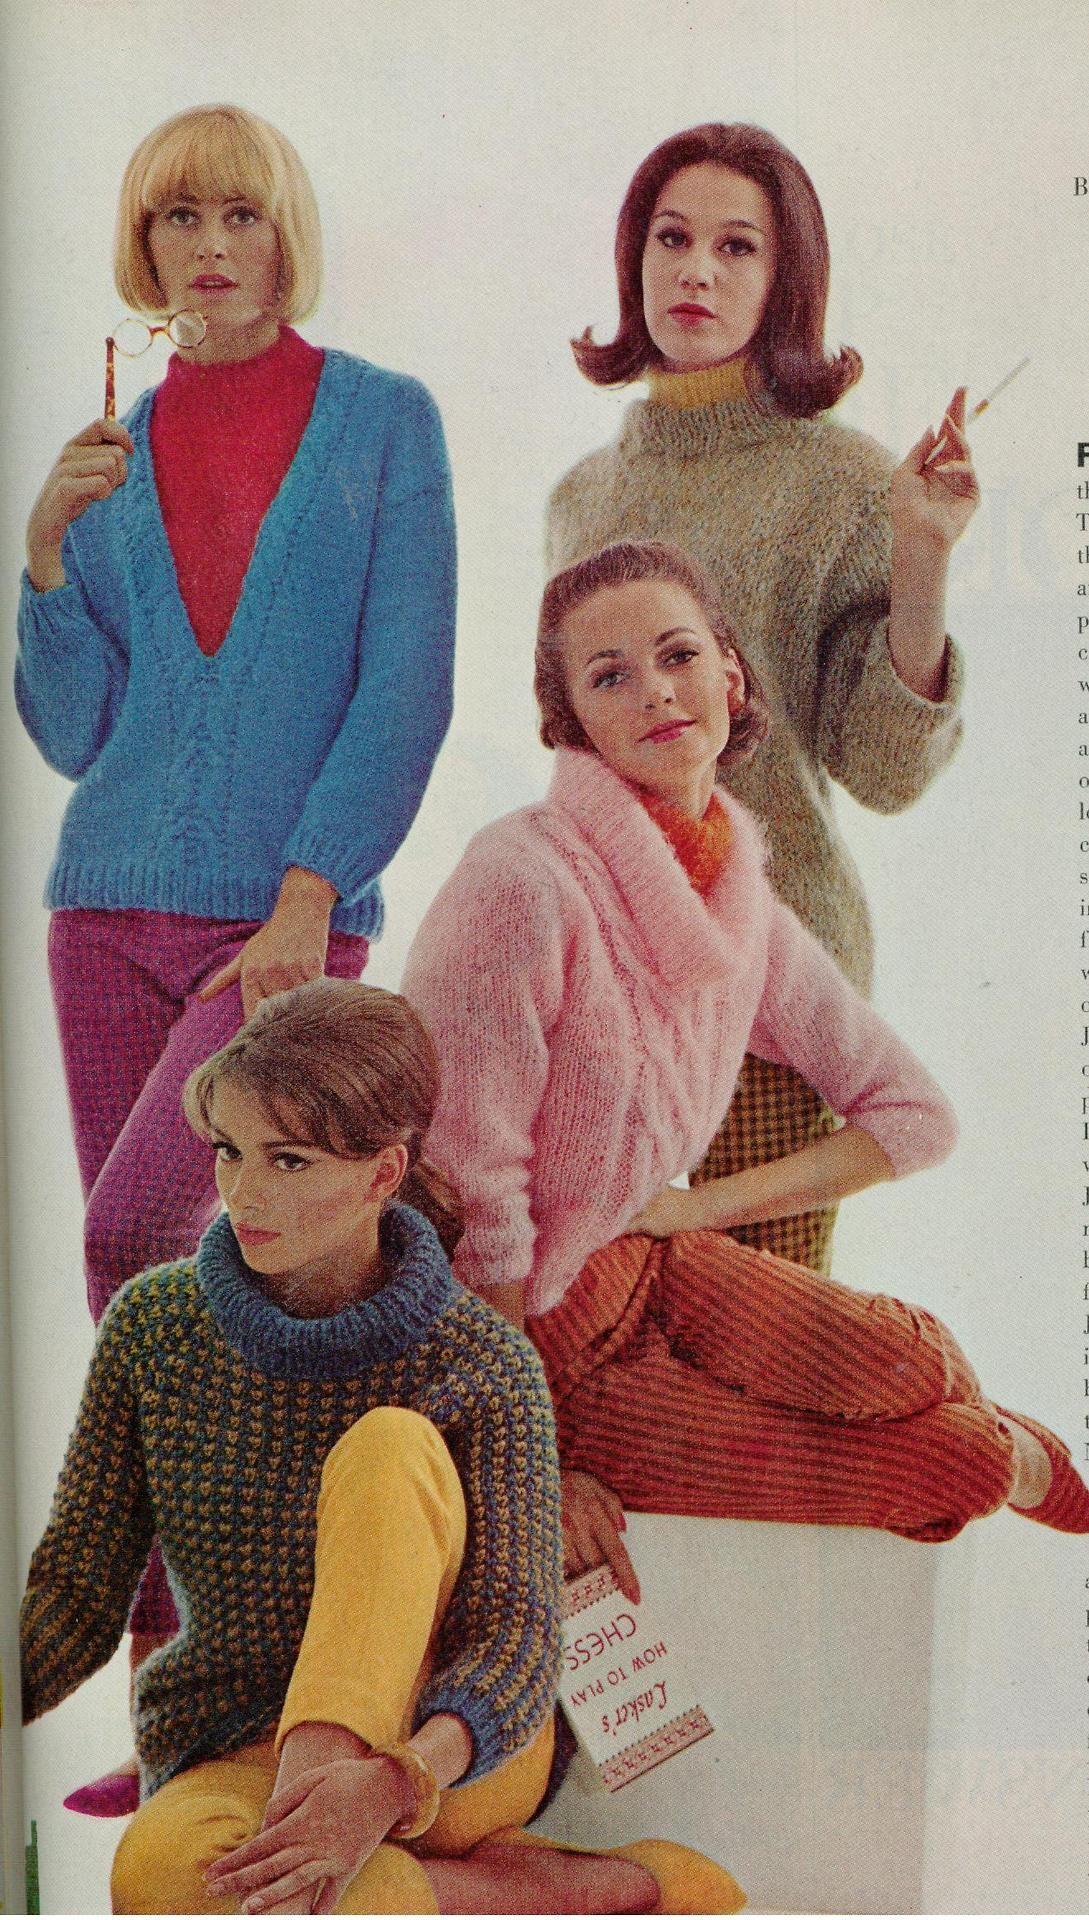 So \u002760\u0027s (1963 \u2014 mohair sweaters very, very popular